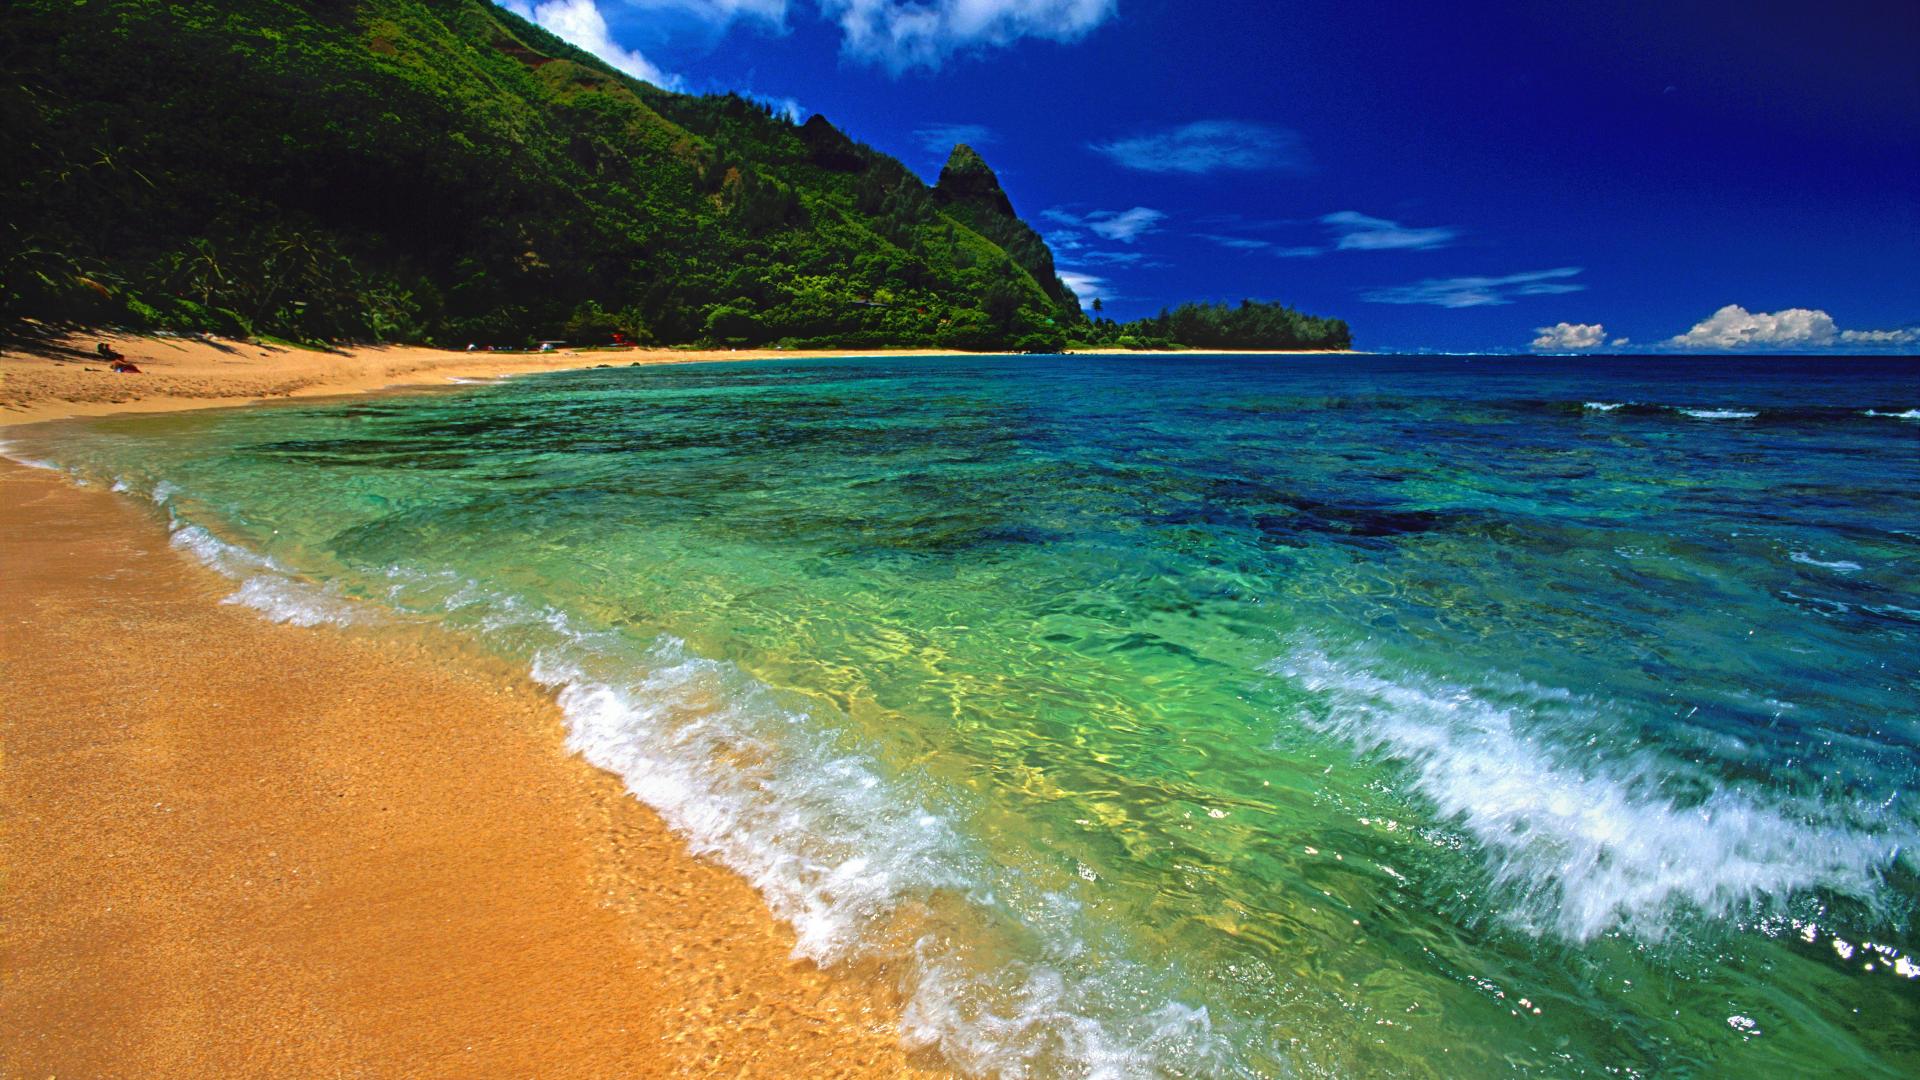 and Wallpaper   Tunnels Beach Kauai Hawaii   Always Download 1920x1080